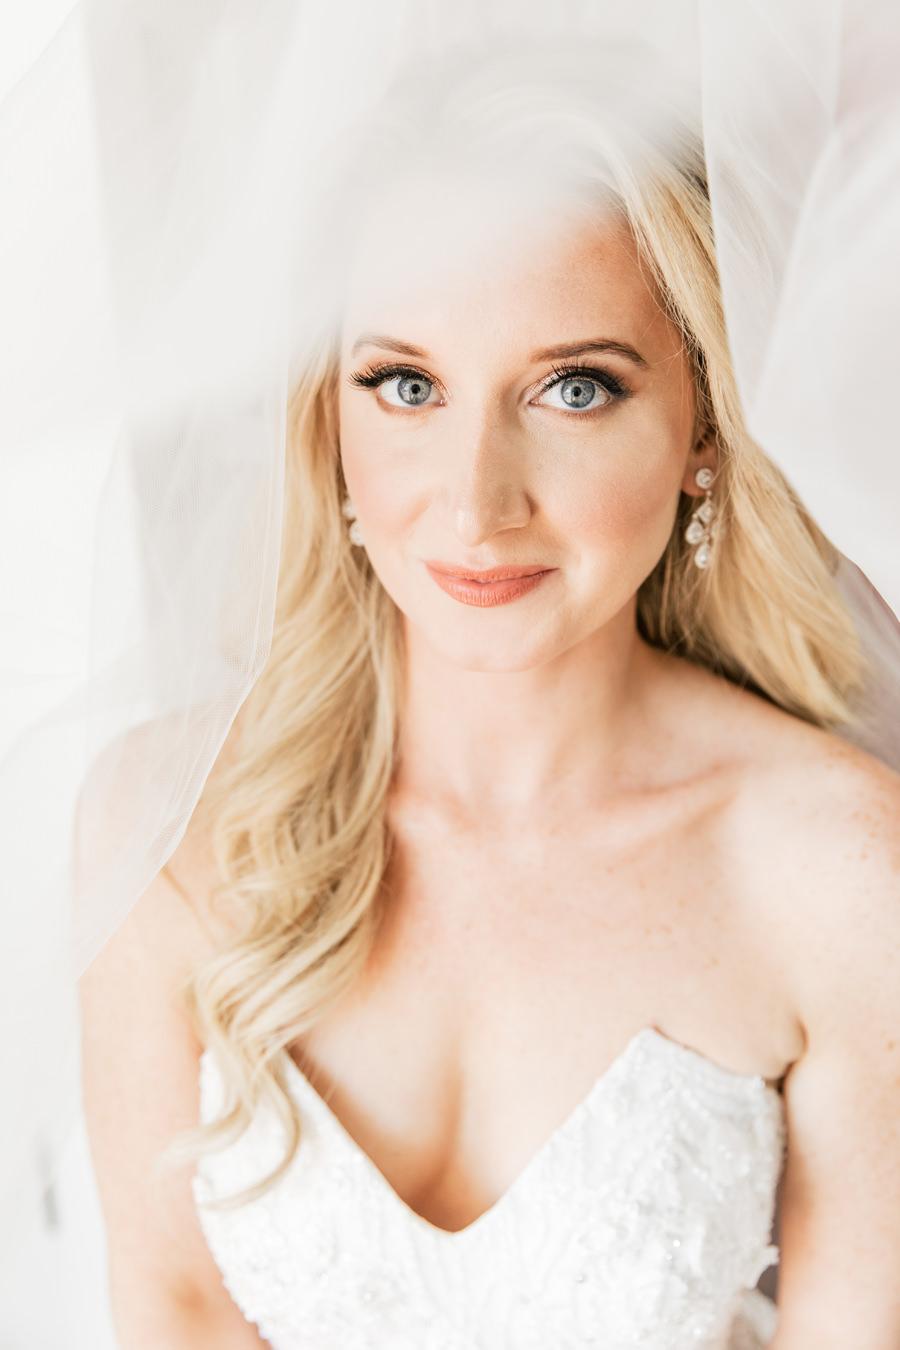 the Ryland inn wedding photographer & Portrait Photographer